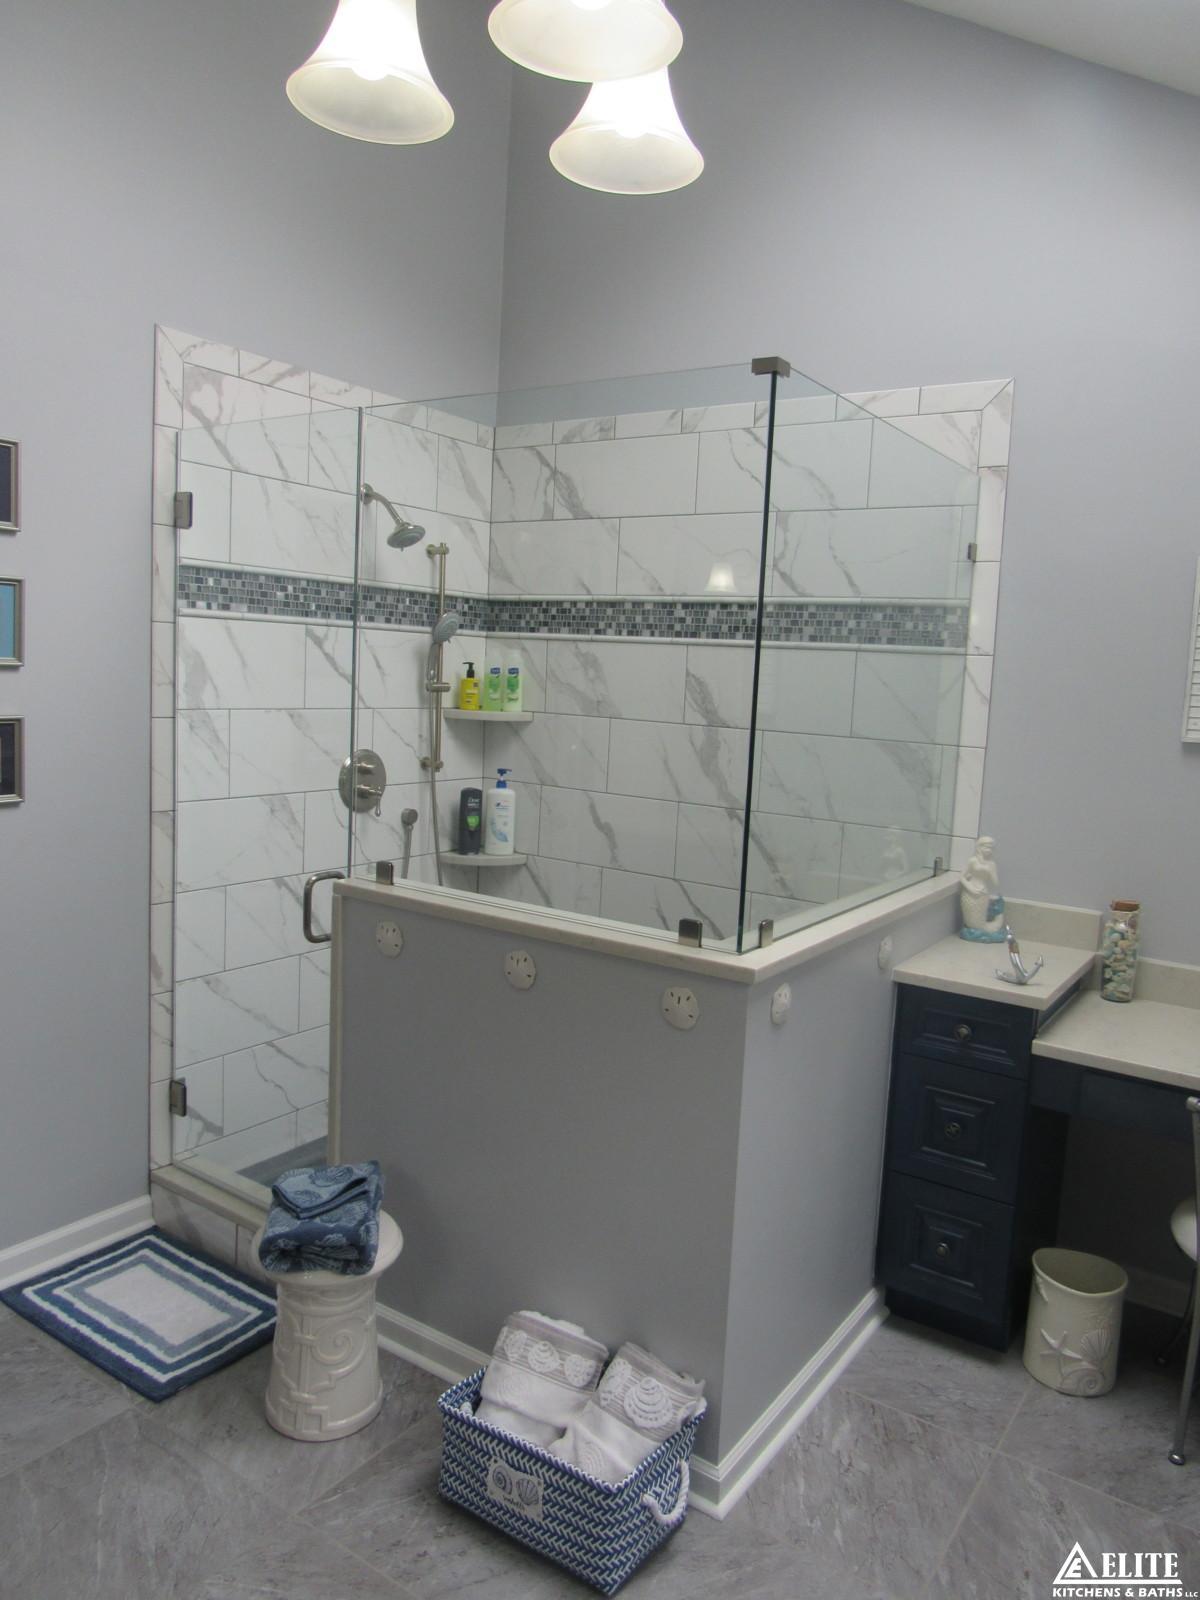 Bathrooms 97